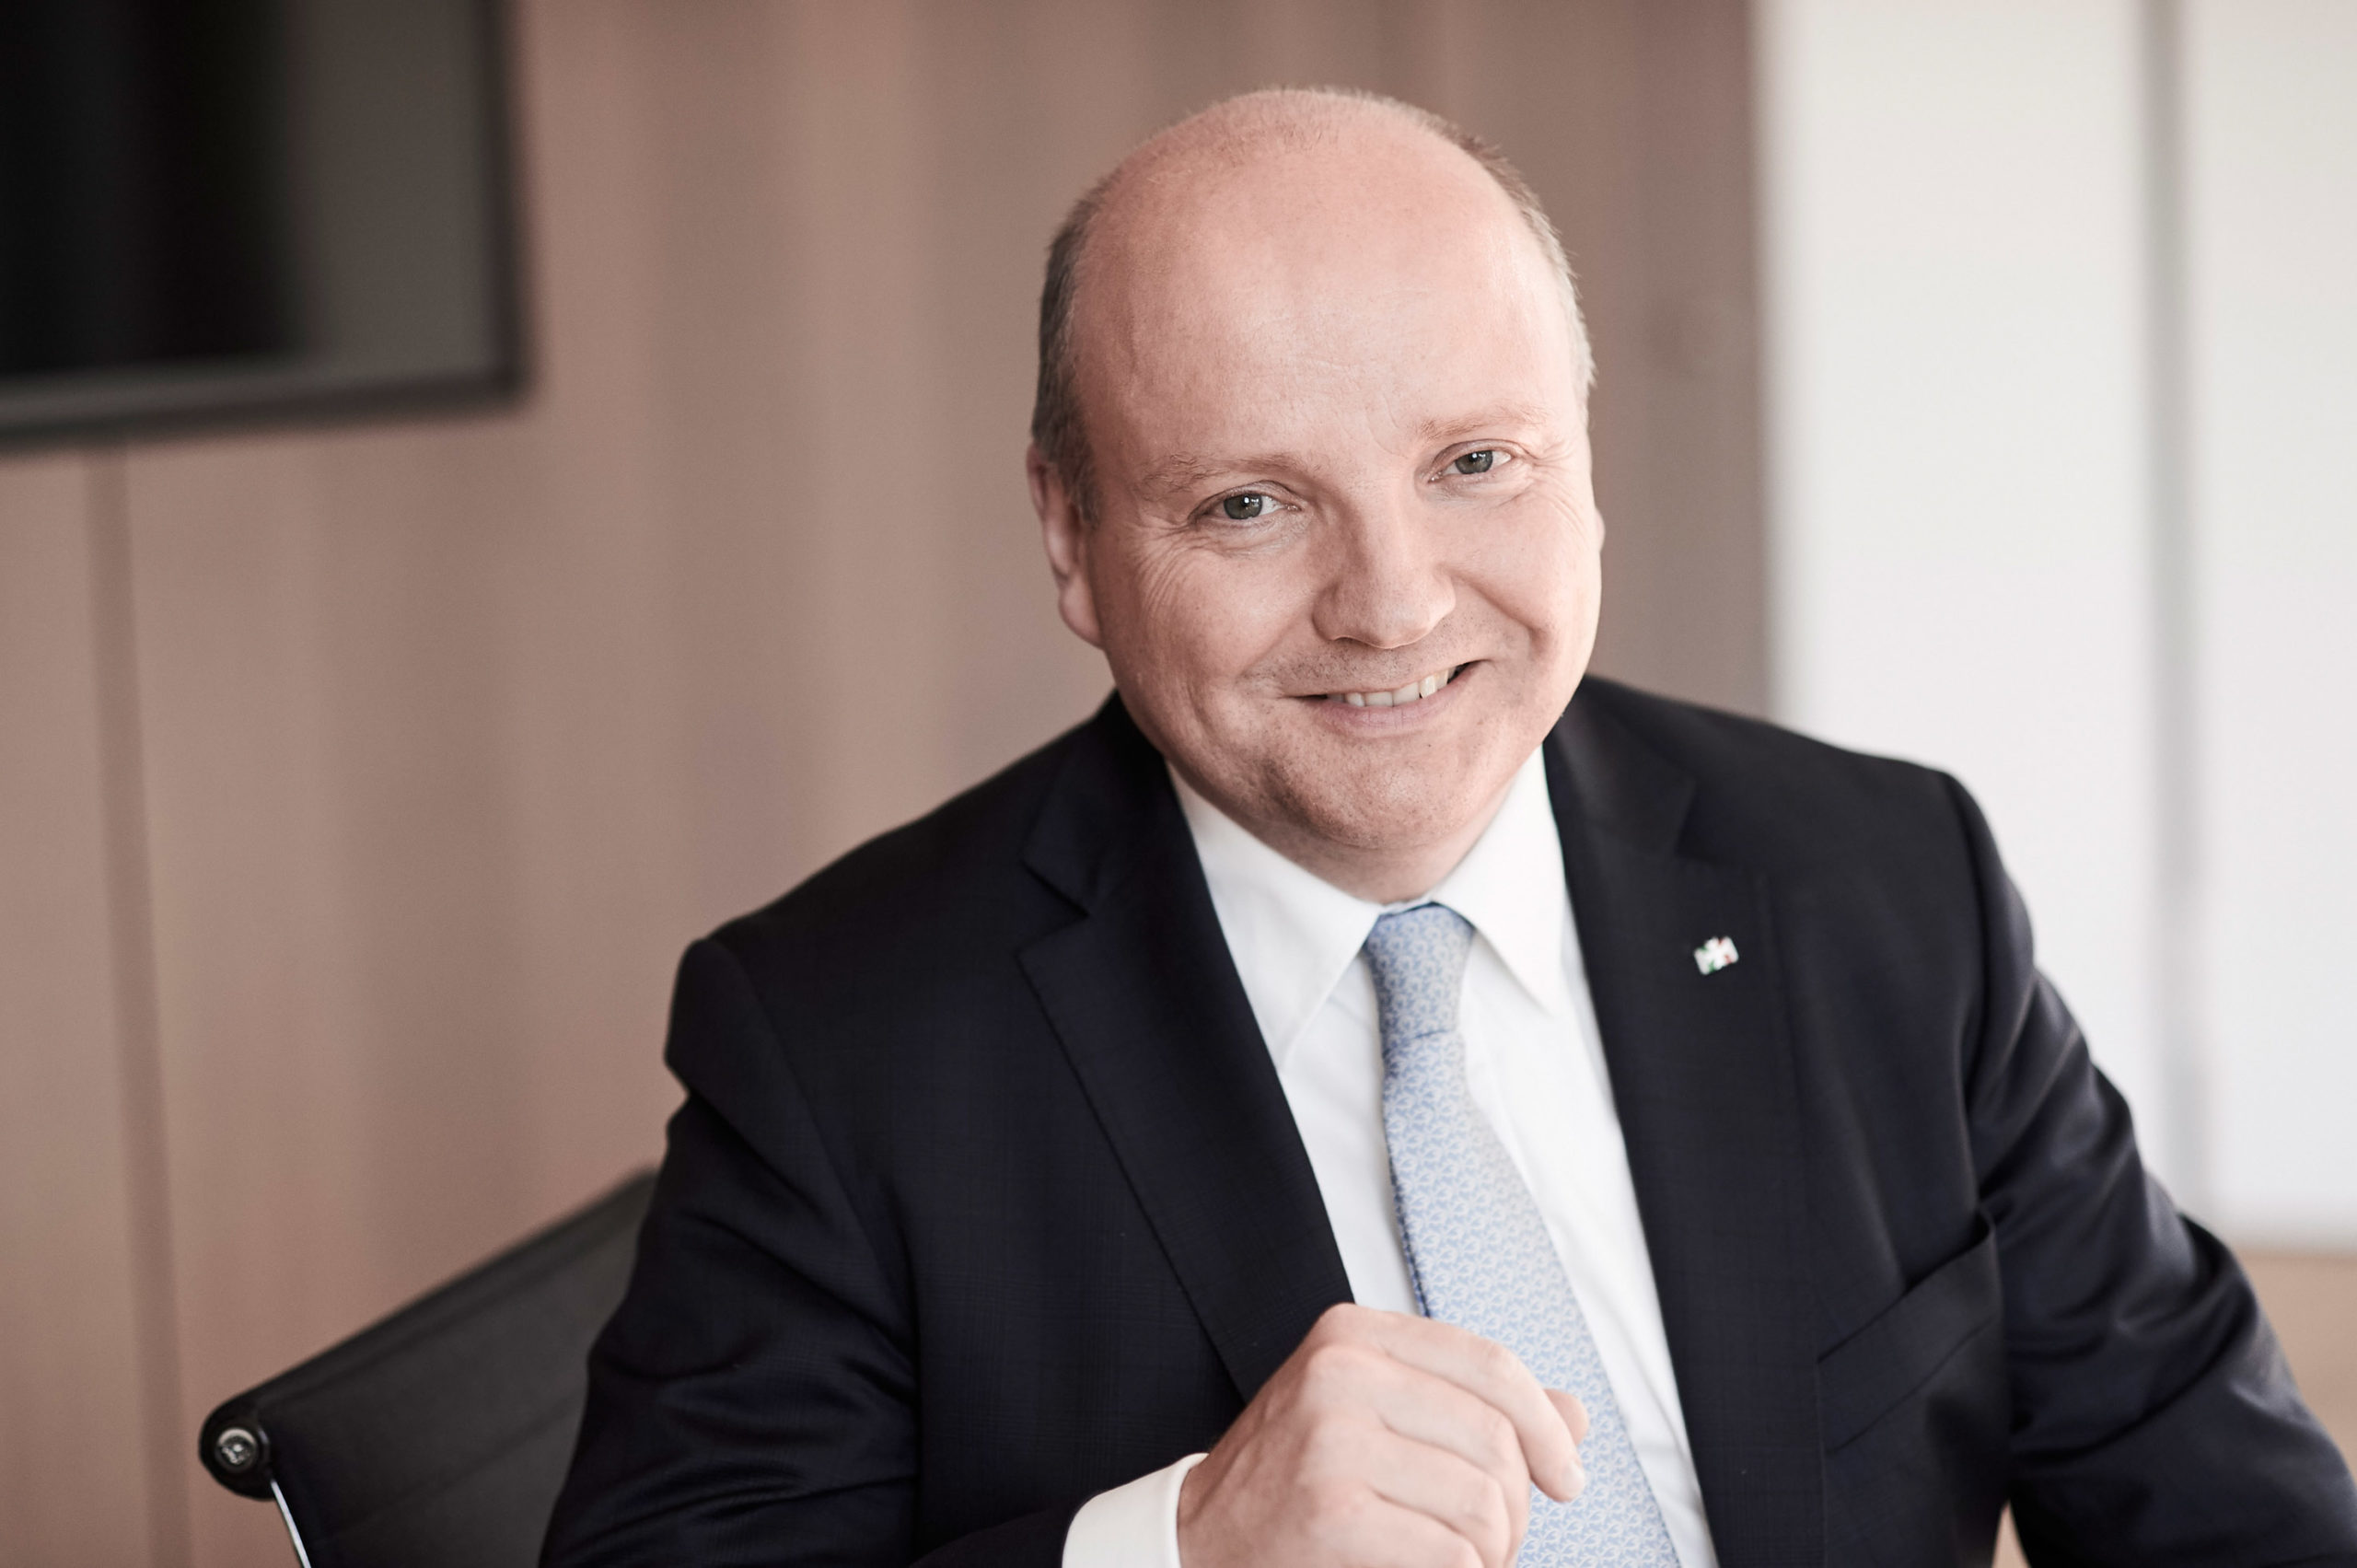 IHK-Präsident Dr. Benedikt Hüffer